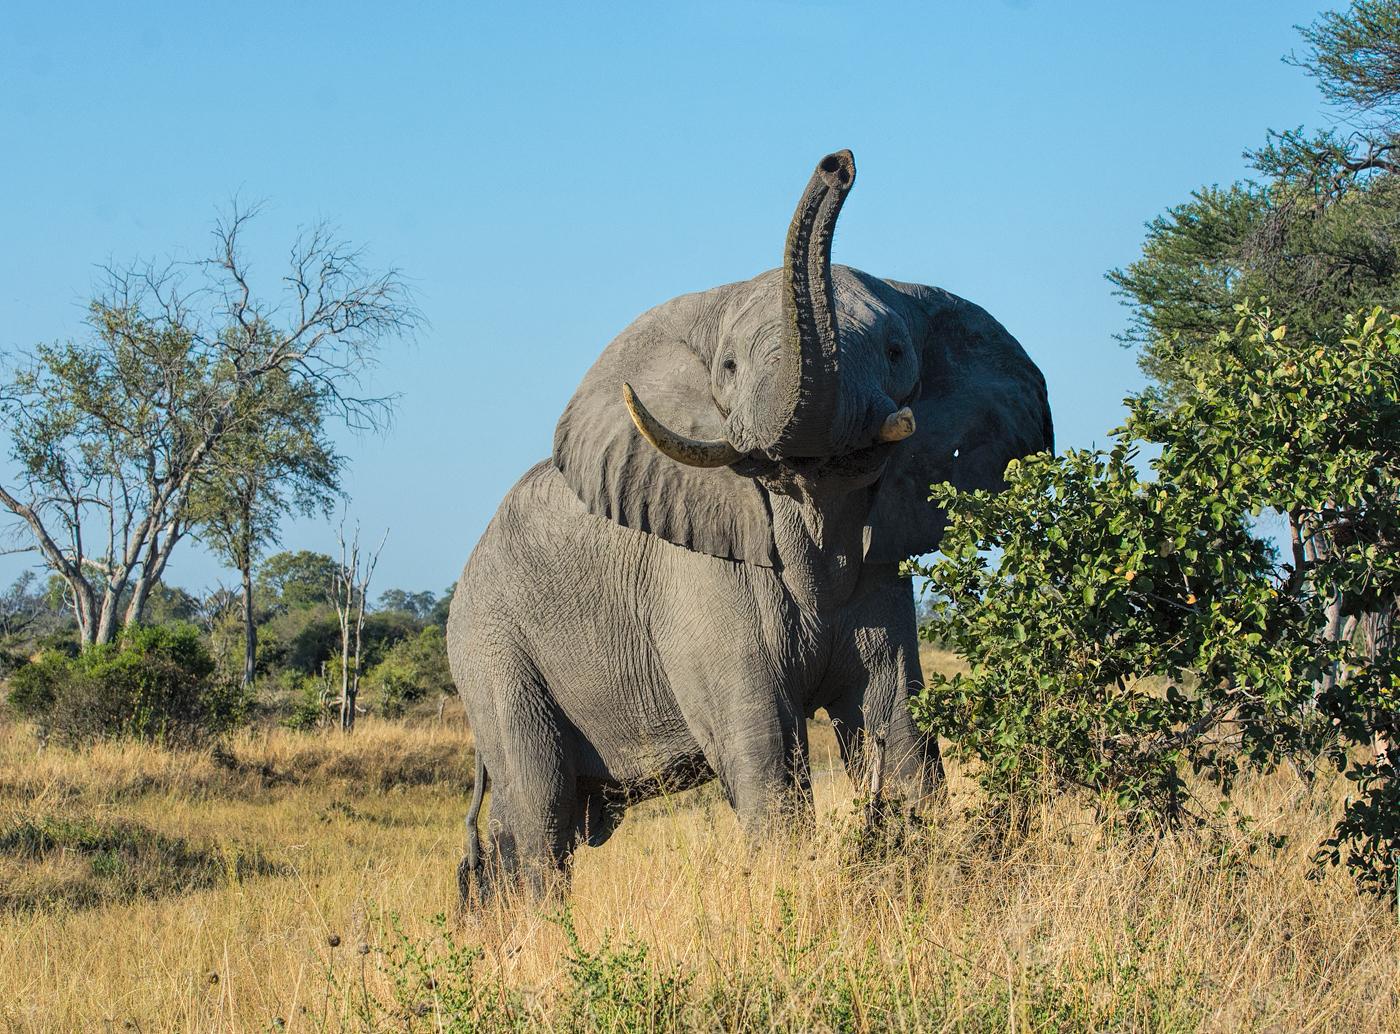 elephant bull, trunk raised